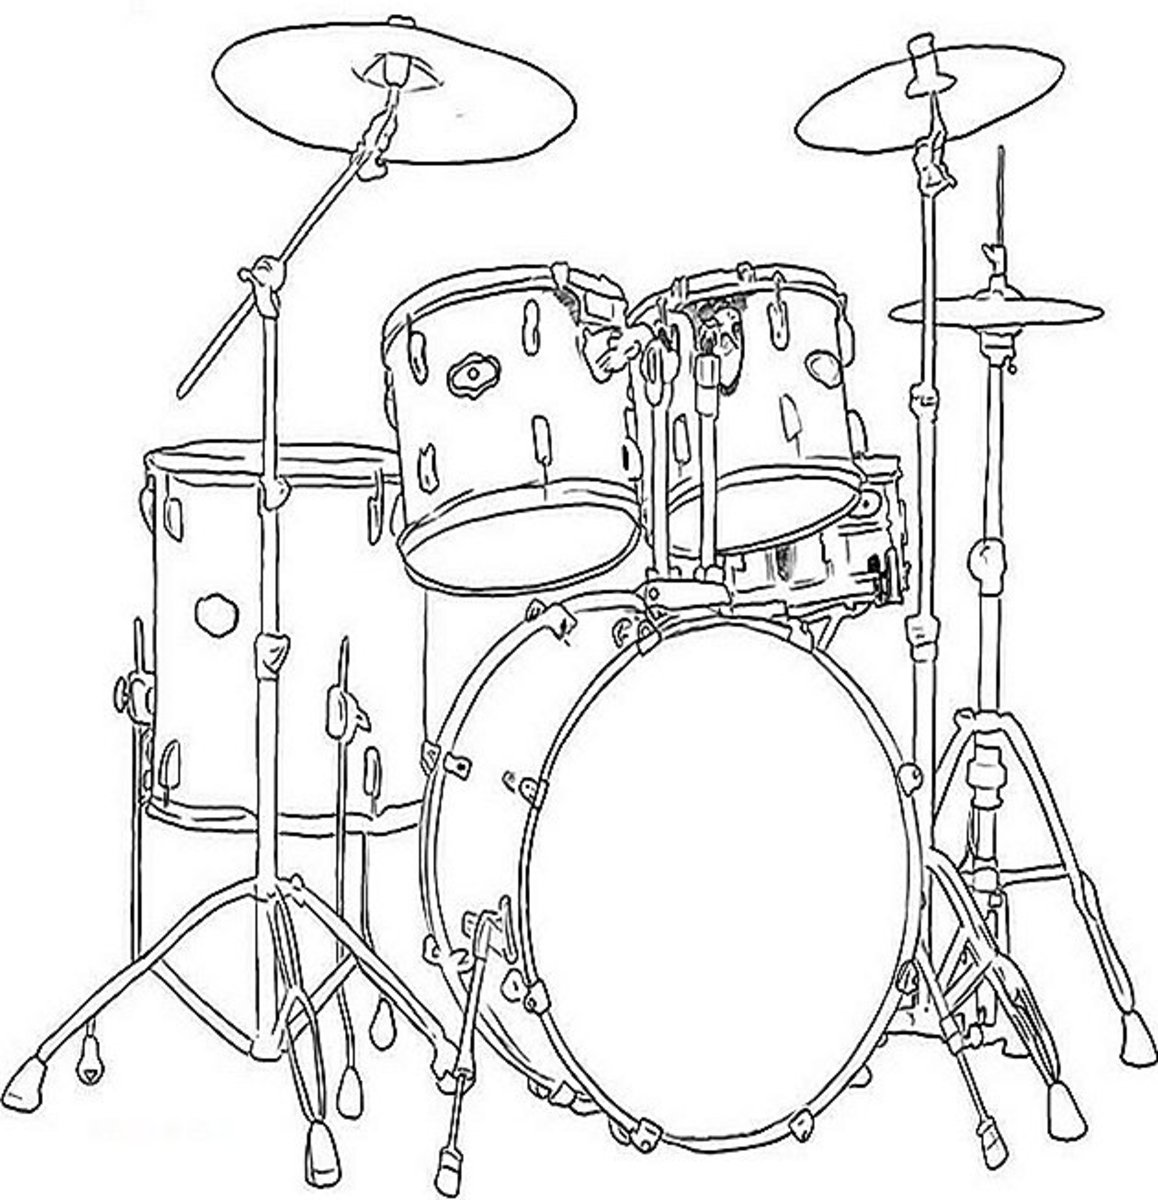 Drum set coloring page